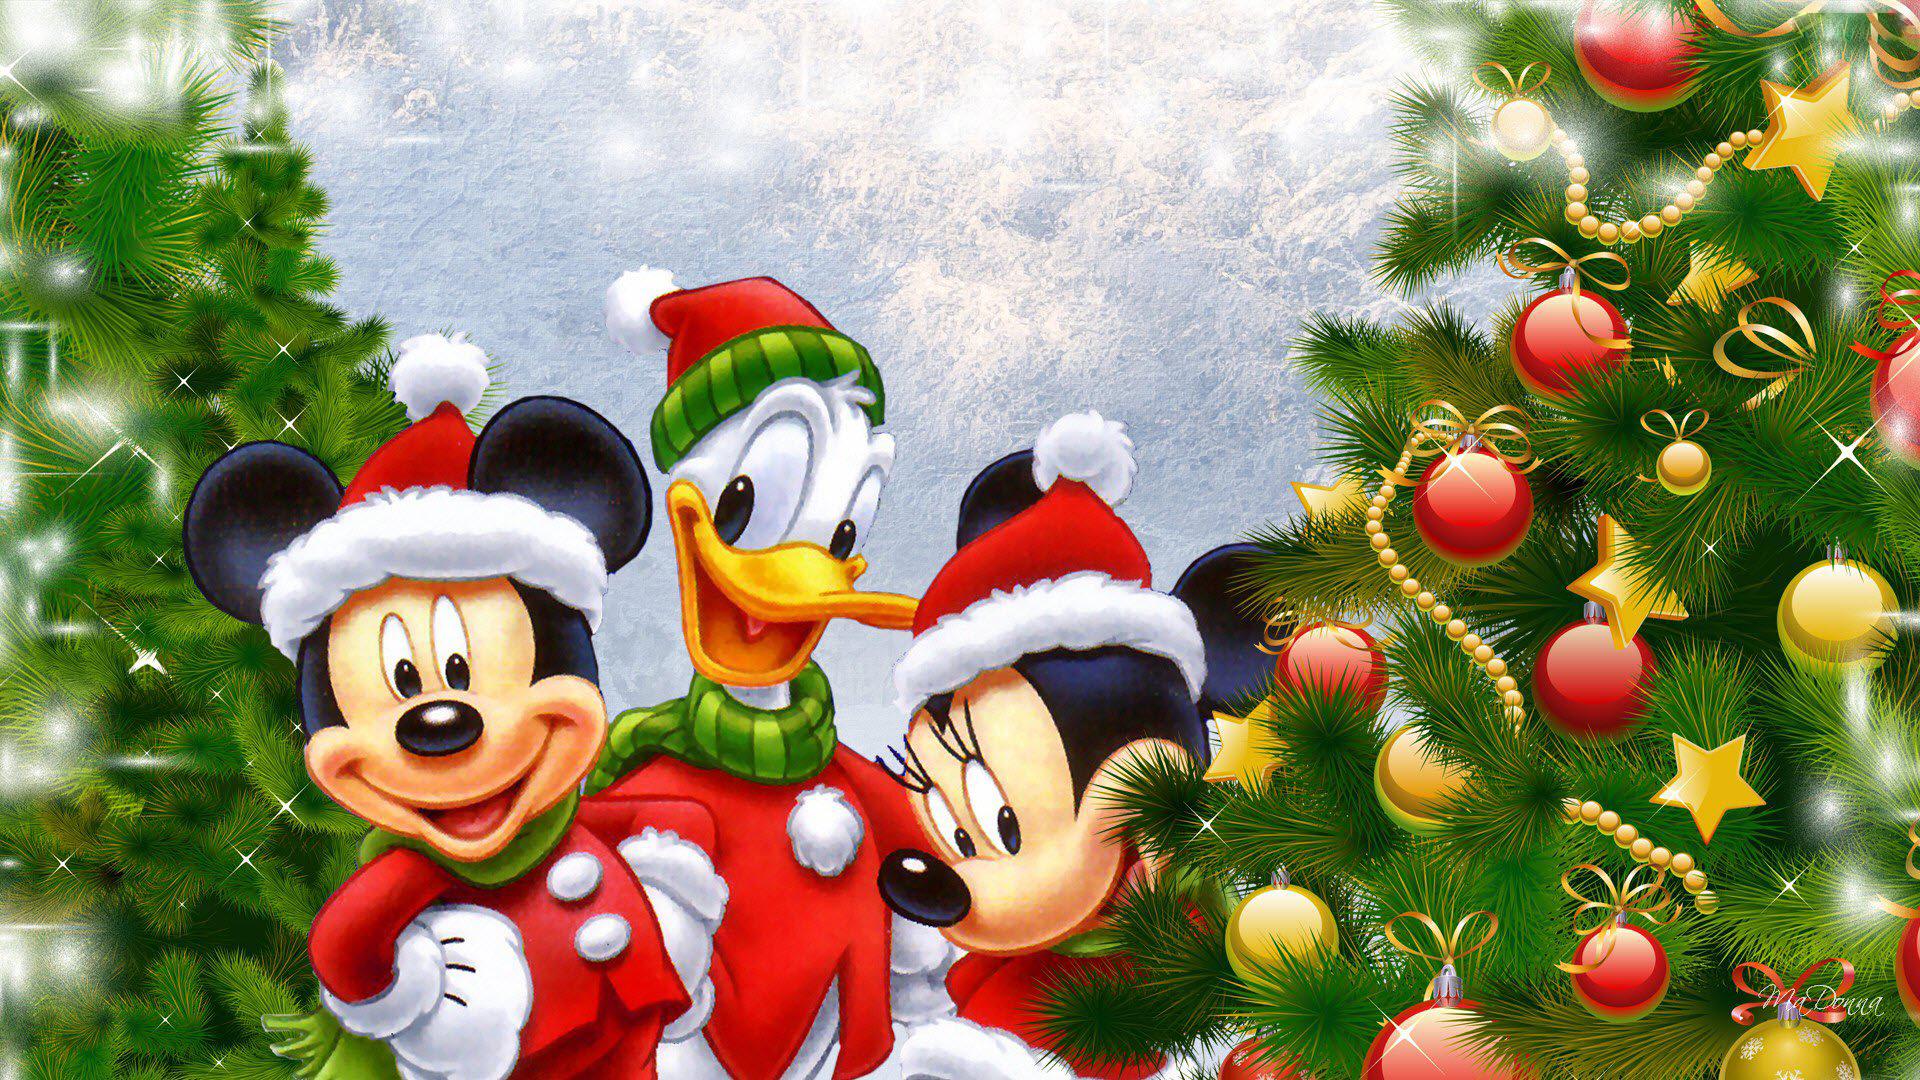 Fall Daisy Wallpaper Disney Christmas Wallpapers Hd Pixelstalk Net